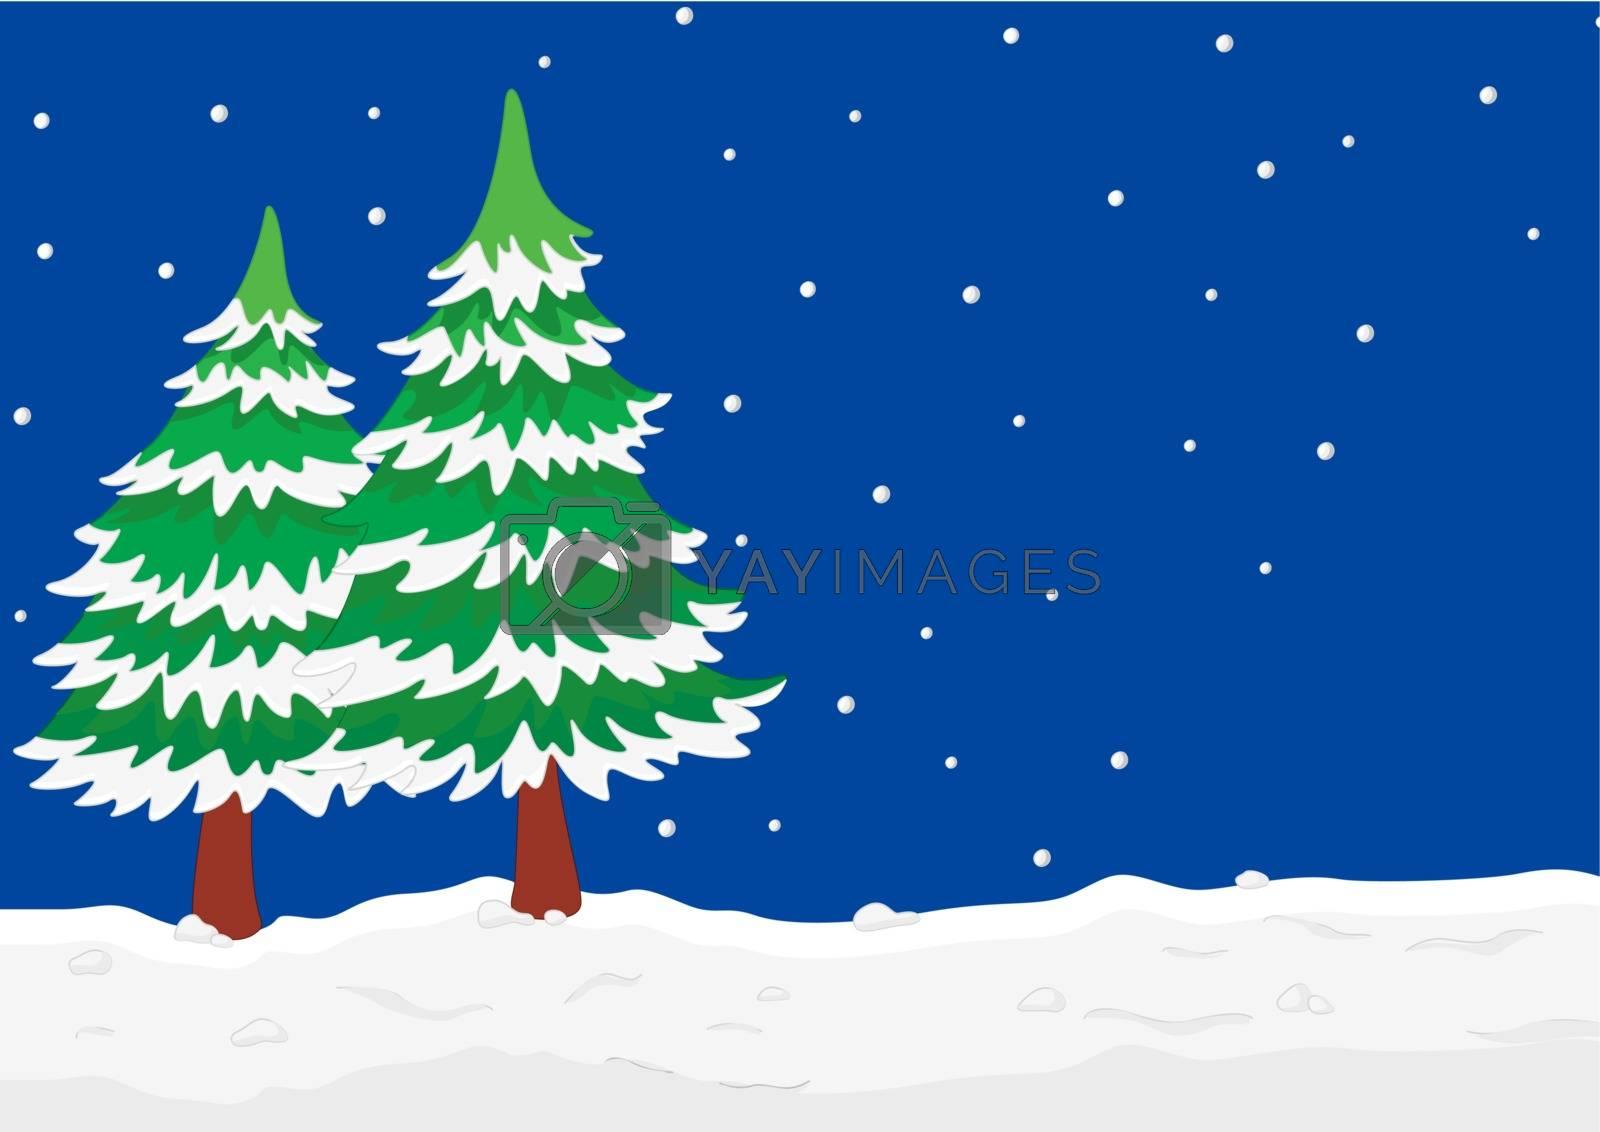 Illustration of a winter scene